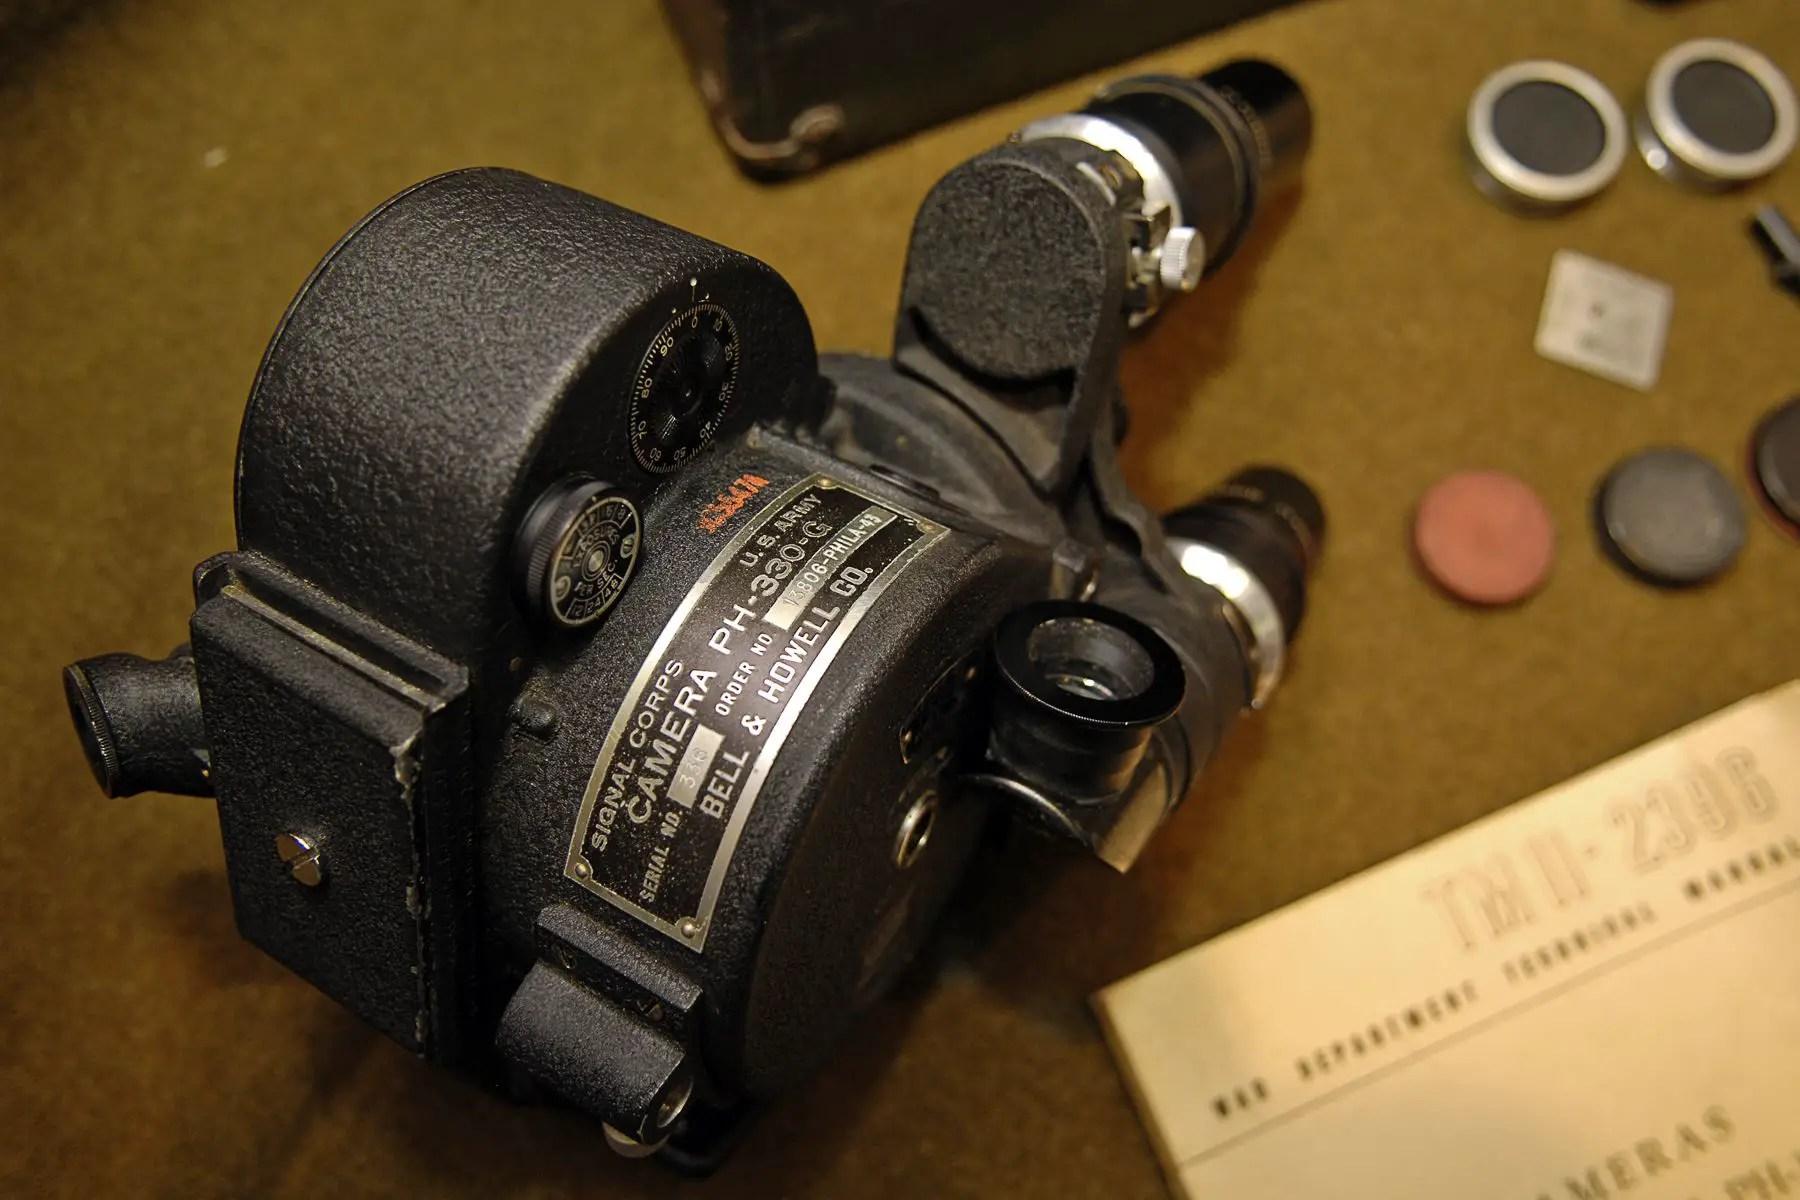 Bell & Howell Foton (1948) - mike eckman dot com